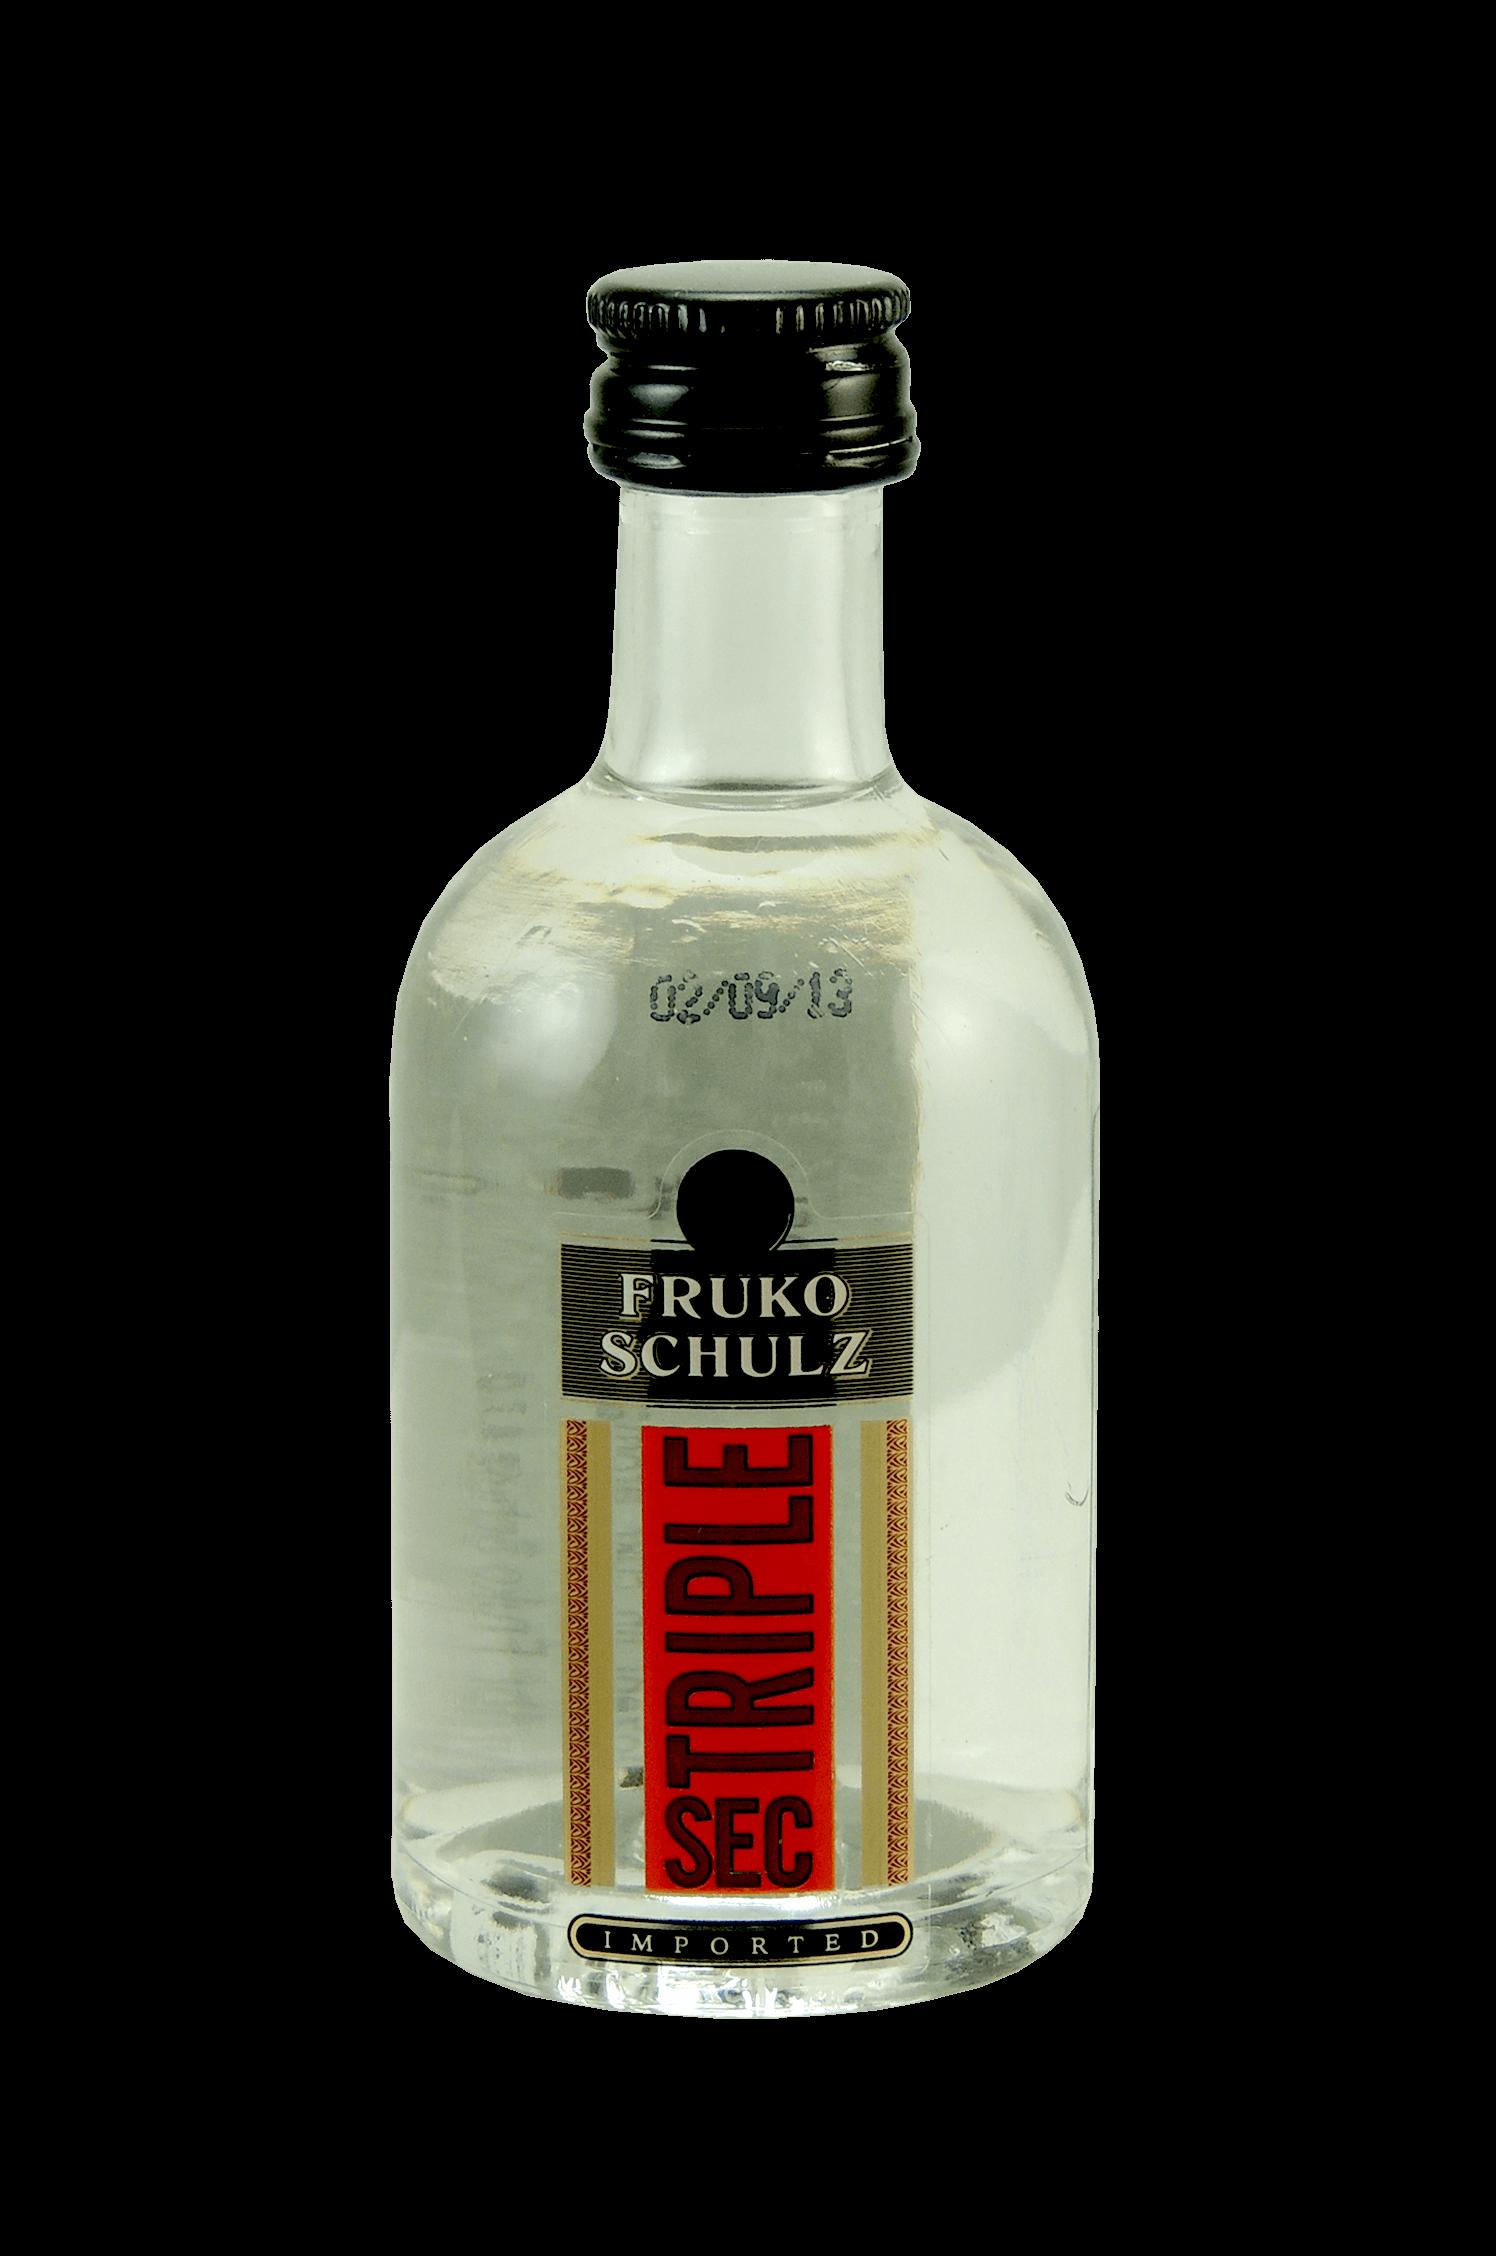 Fruko Triple Sec